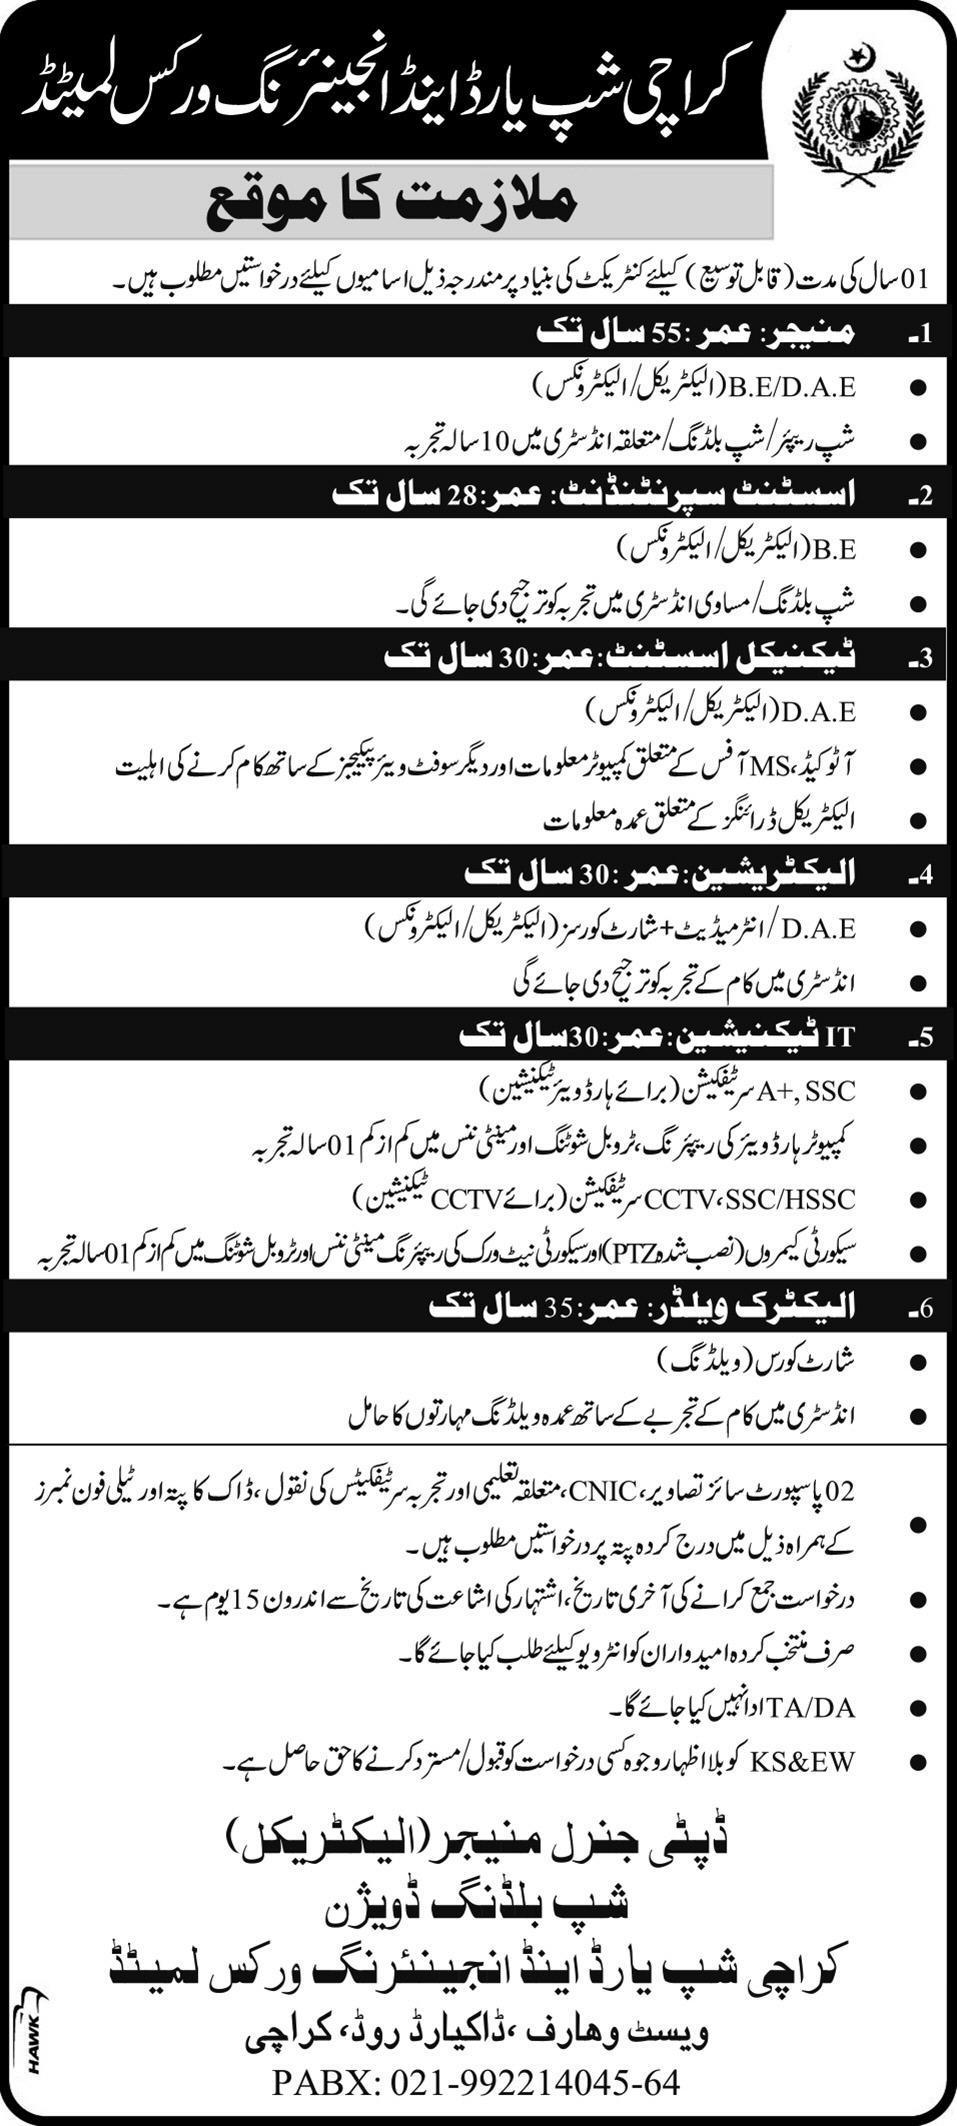 Karachi Shipyard and Engineering Works Jobs Application